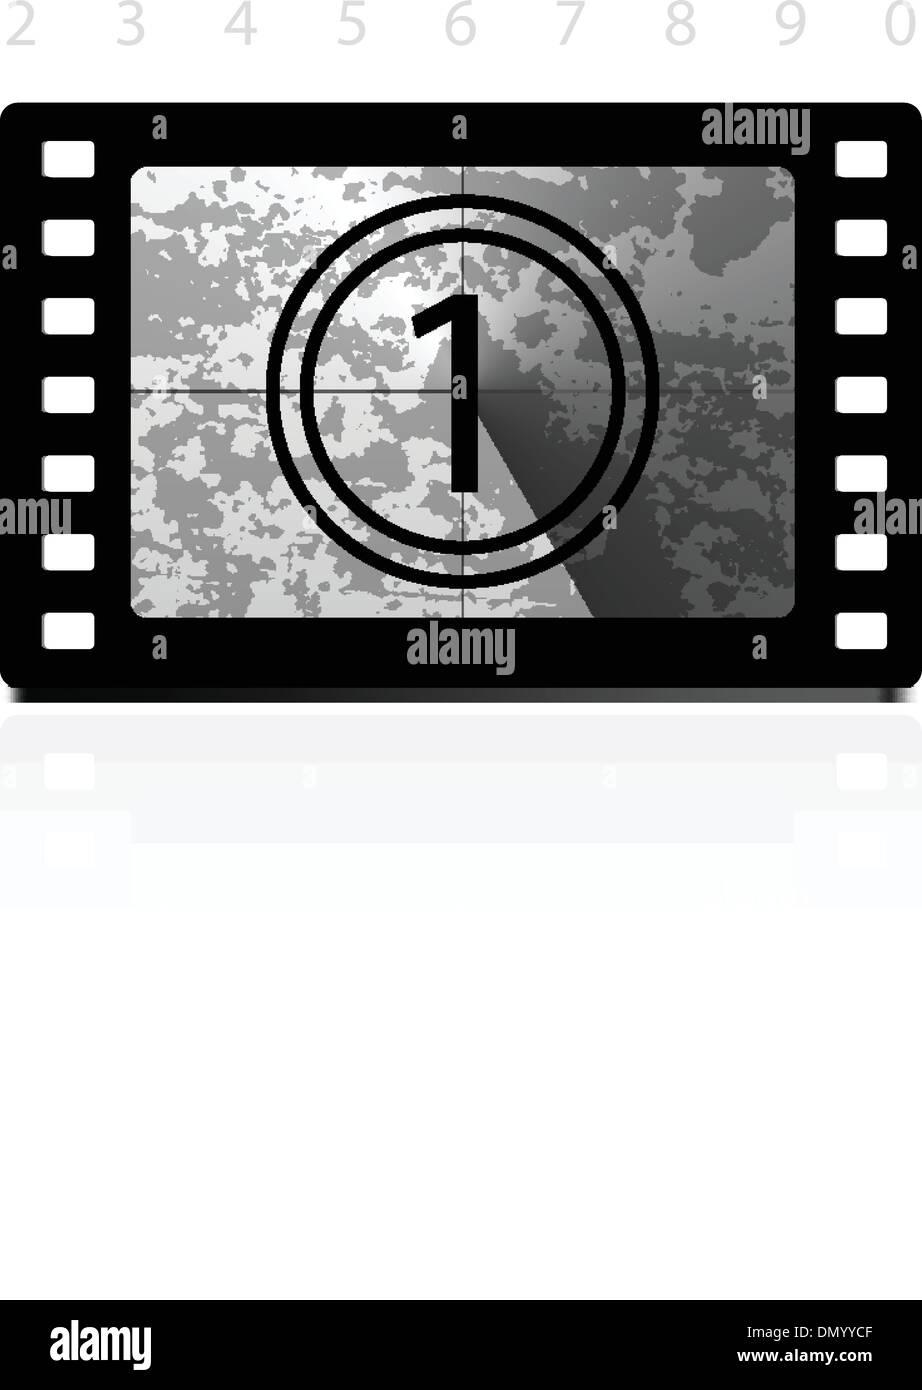 Film Countdown: Film Frame Countdown Stock Photos & Film Frame Countdown